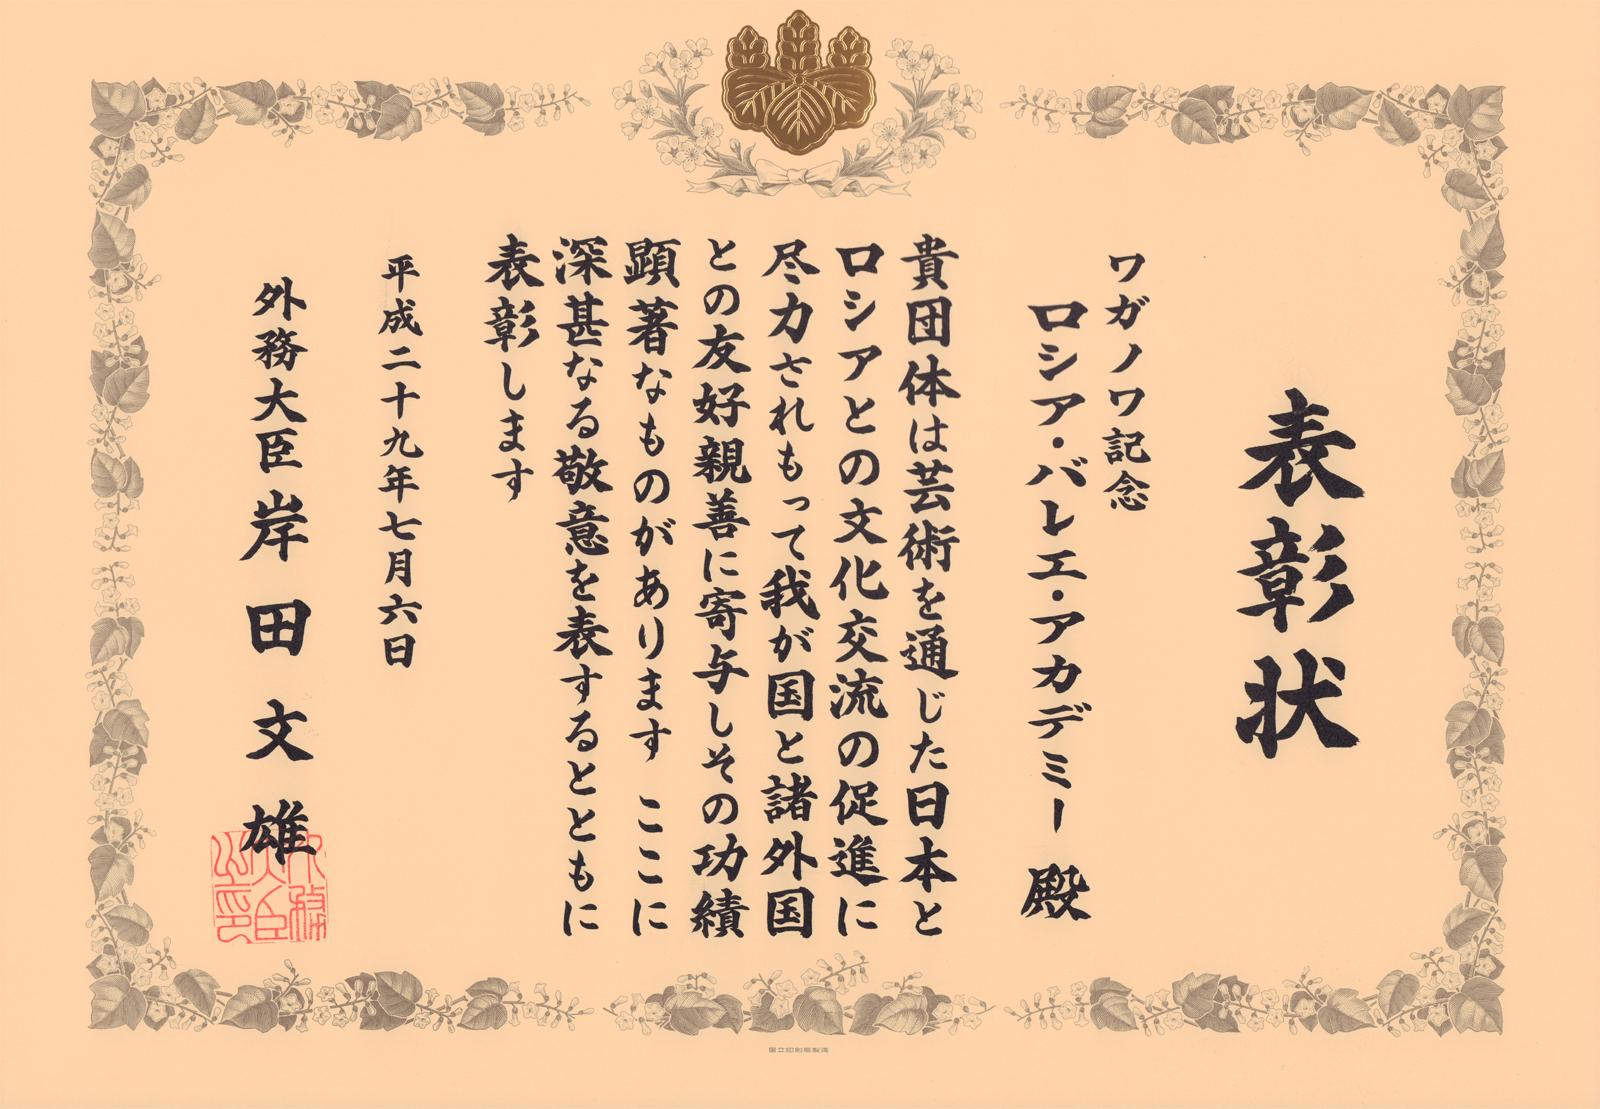 http://vaganovaacademy.ru/vaganova/news/photo/01.09.17%20%D0%94%D0%B5%D0%BD%D1%8C%20%D0%B7%D0%BD%D0%B0%D0%BD%D0%B8%D0%B9/Japan-gramota.jpg